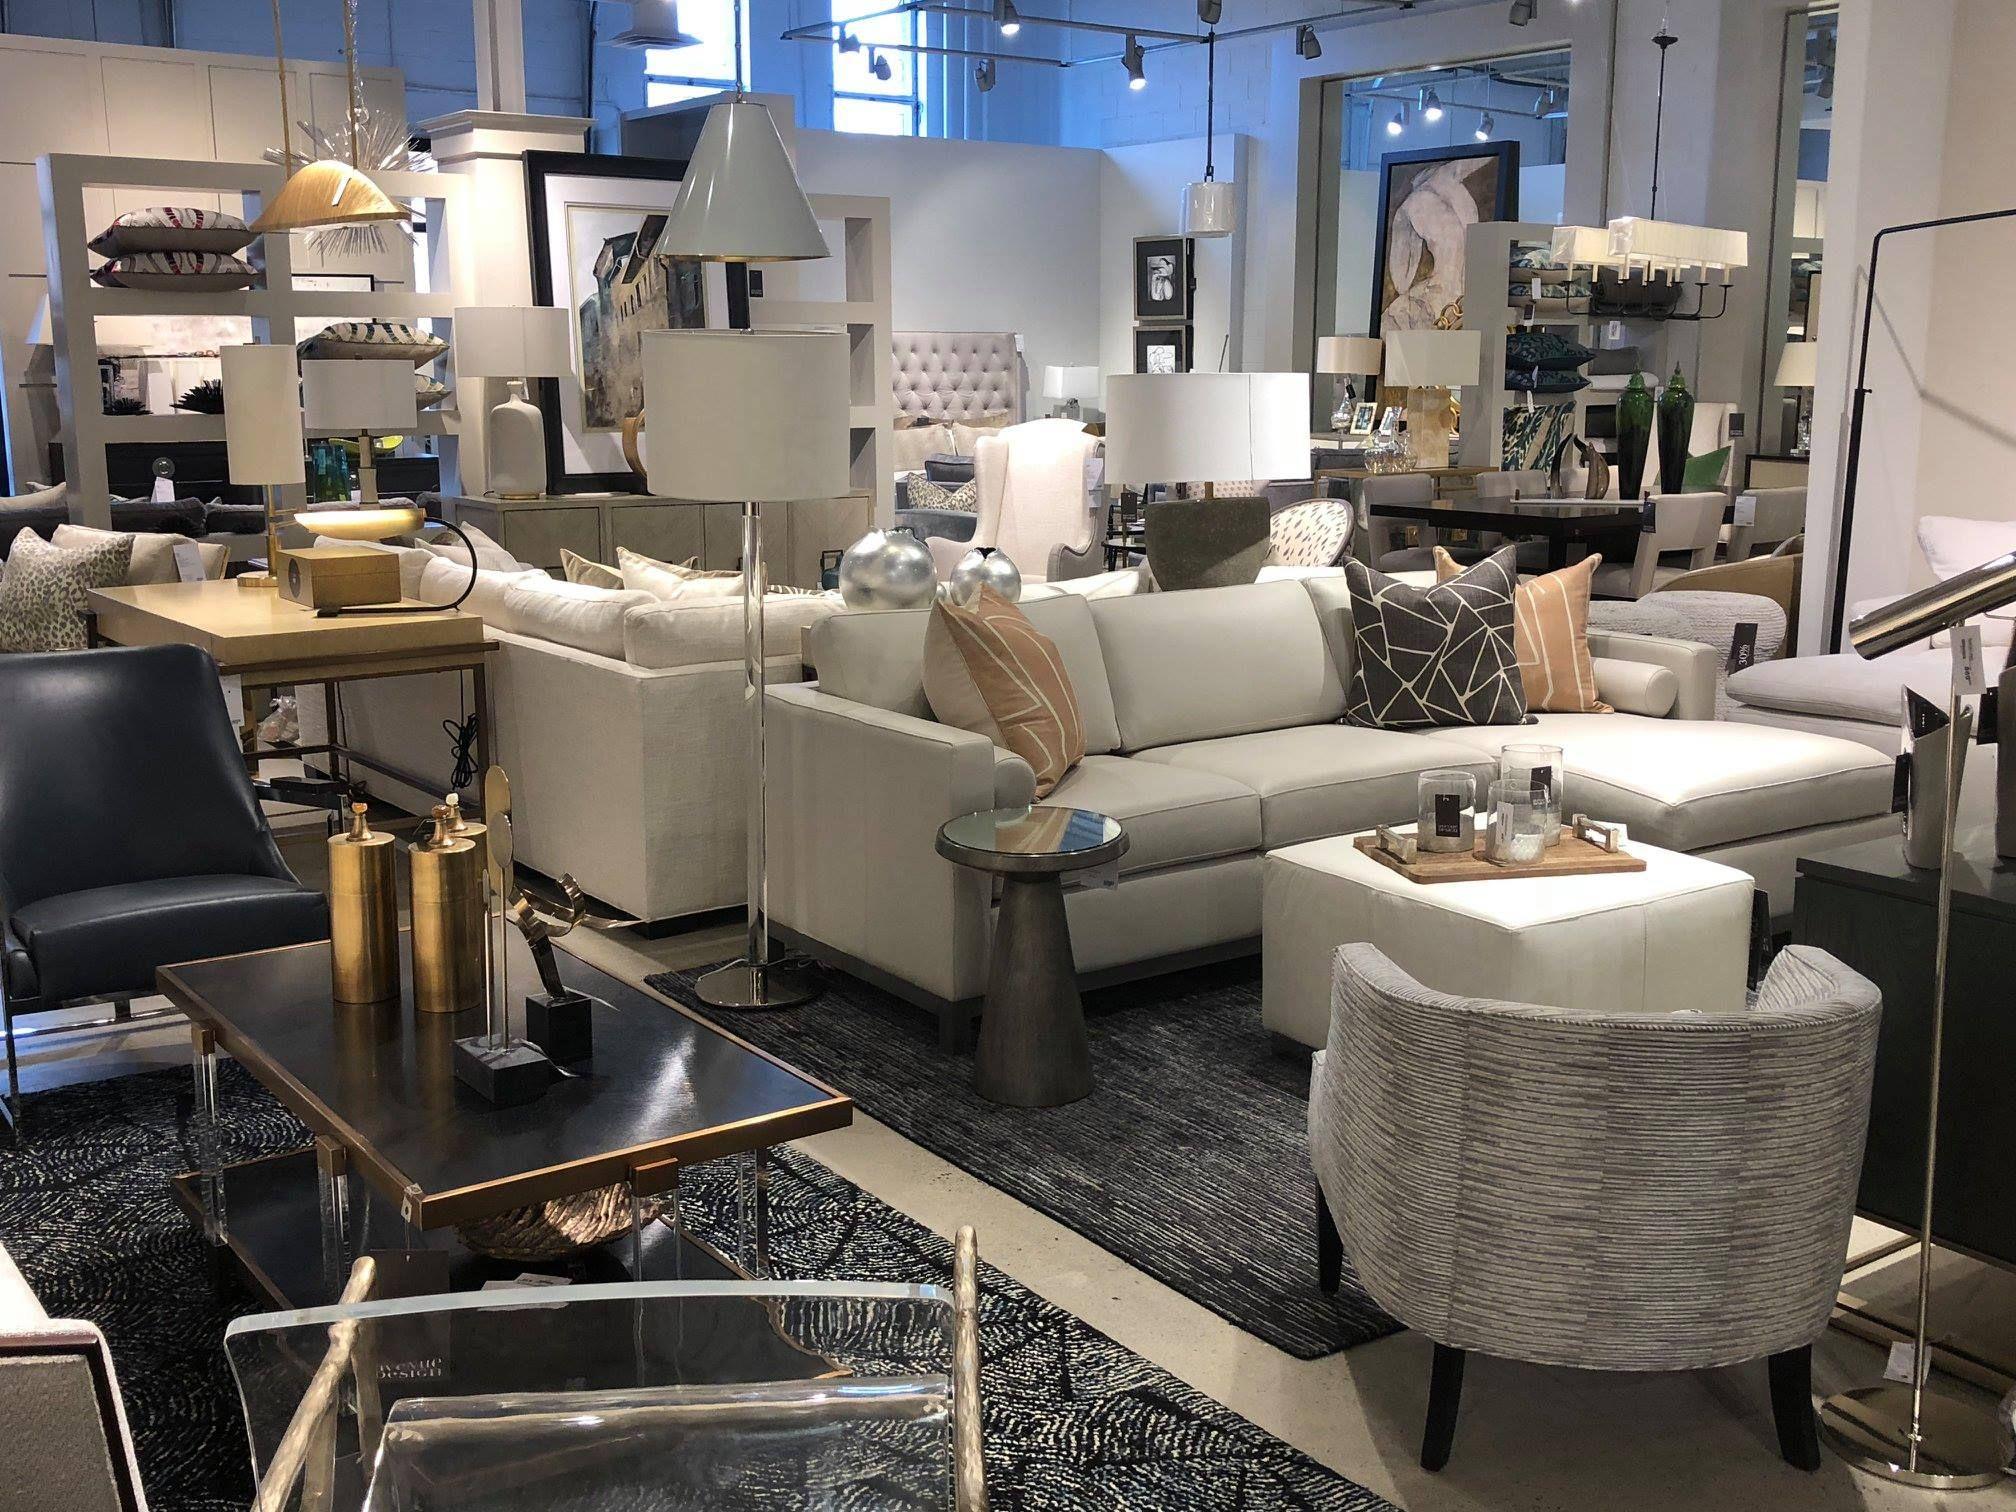 Avenue Design High End Furniture Store In Montreal Avenue Design